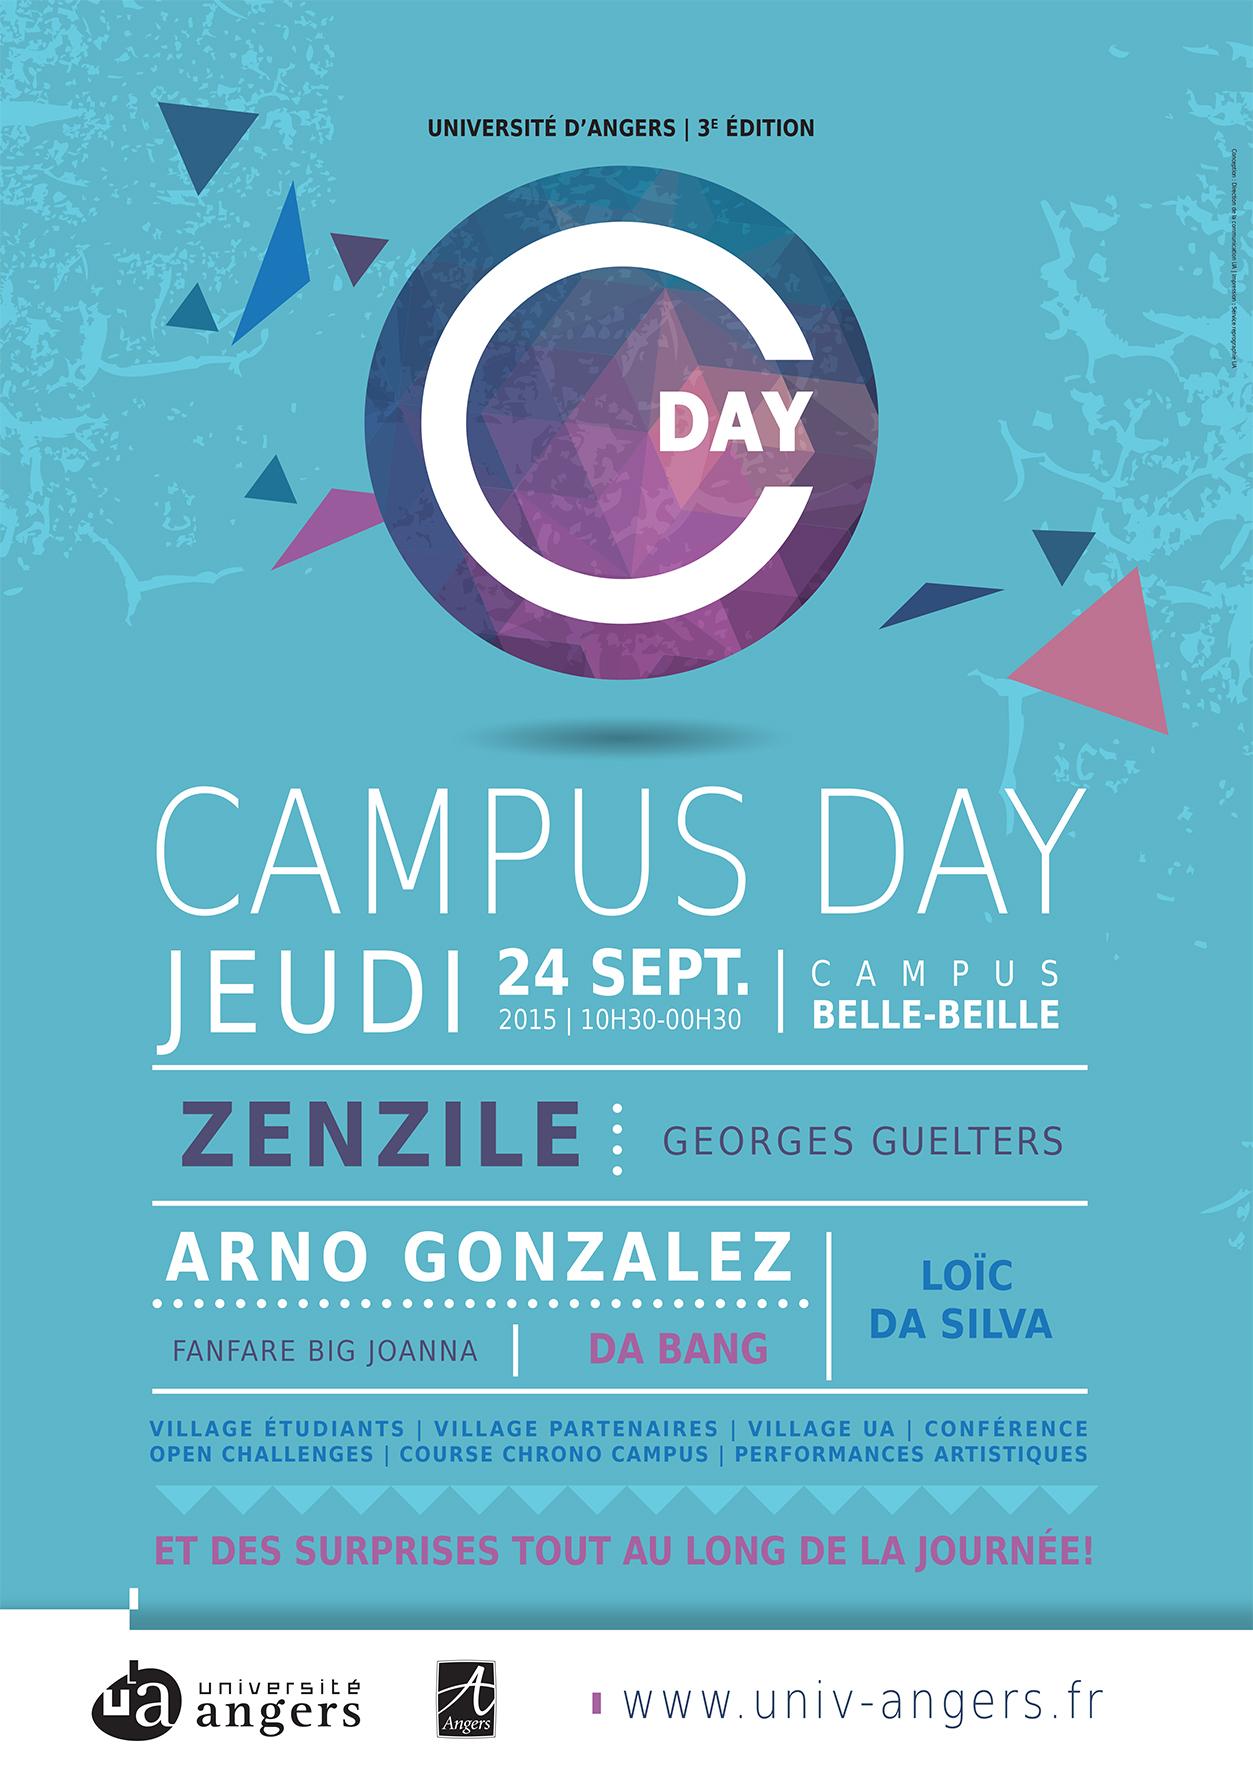 affiche_A3_campus_day_sept_2015 copie